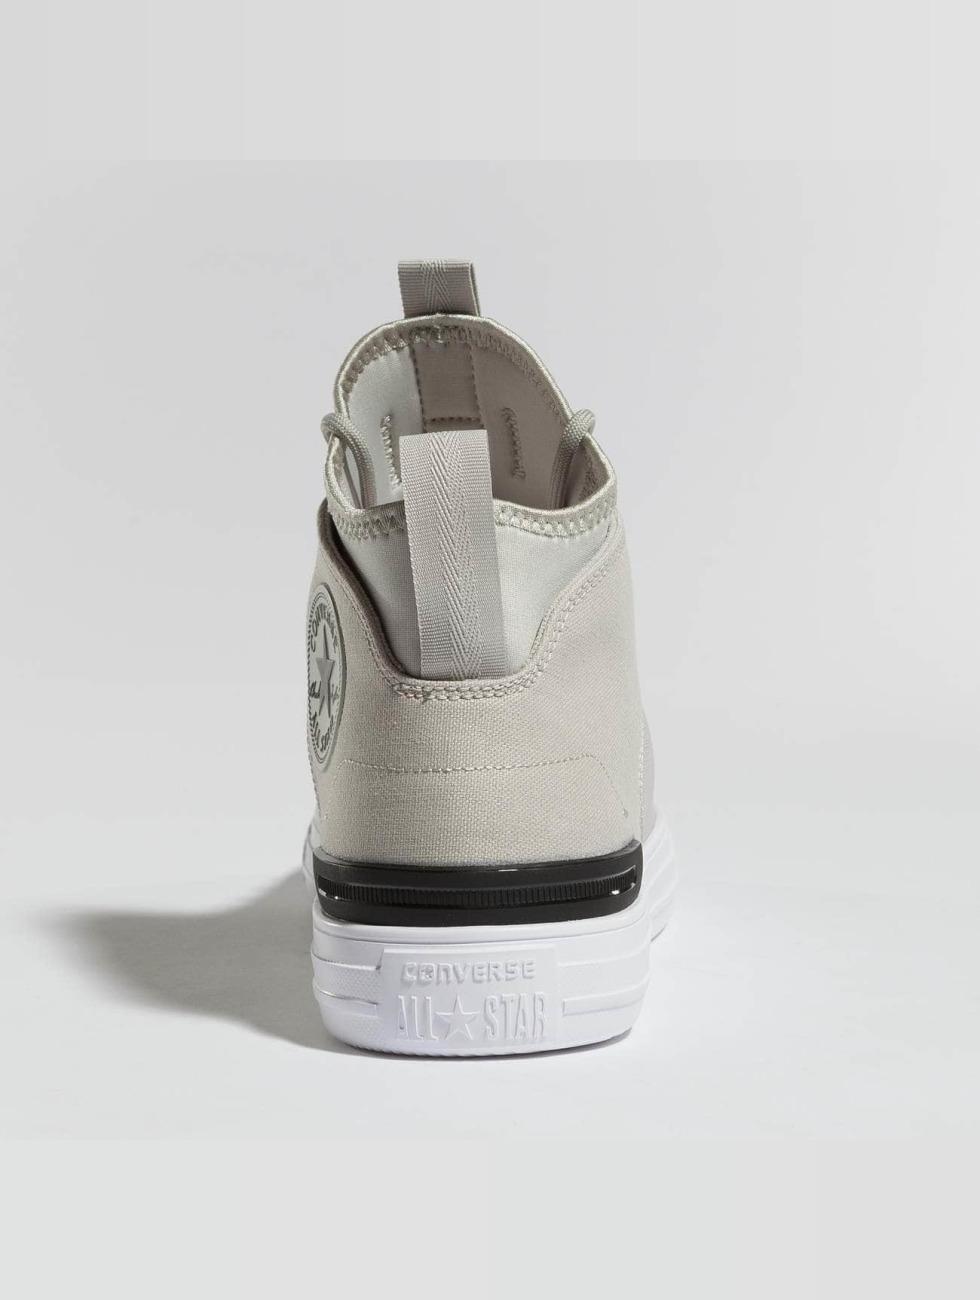 Converse schoen / sneaker Chuck Taylor All Star in grijs 414135 Klaring Beste Winkel Te Krijgen mhRMvfGJ